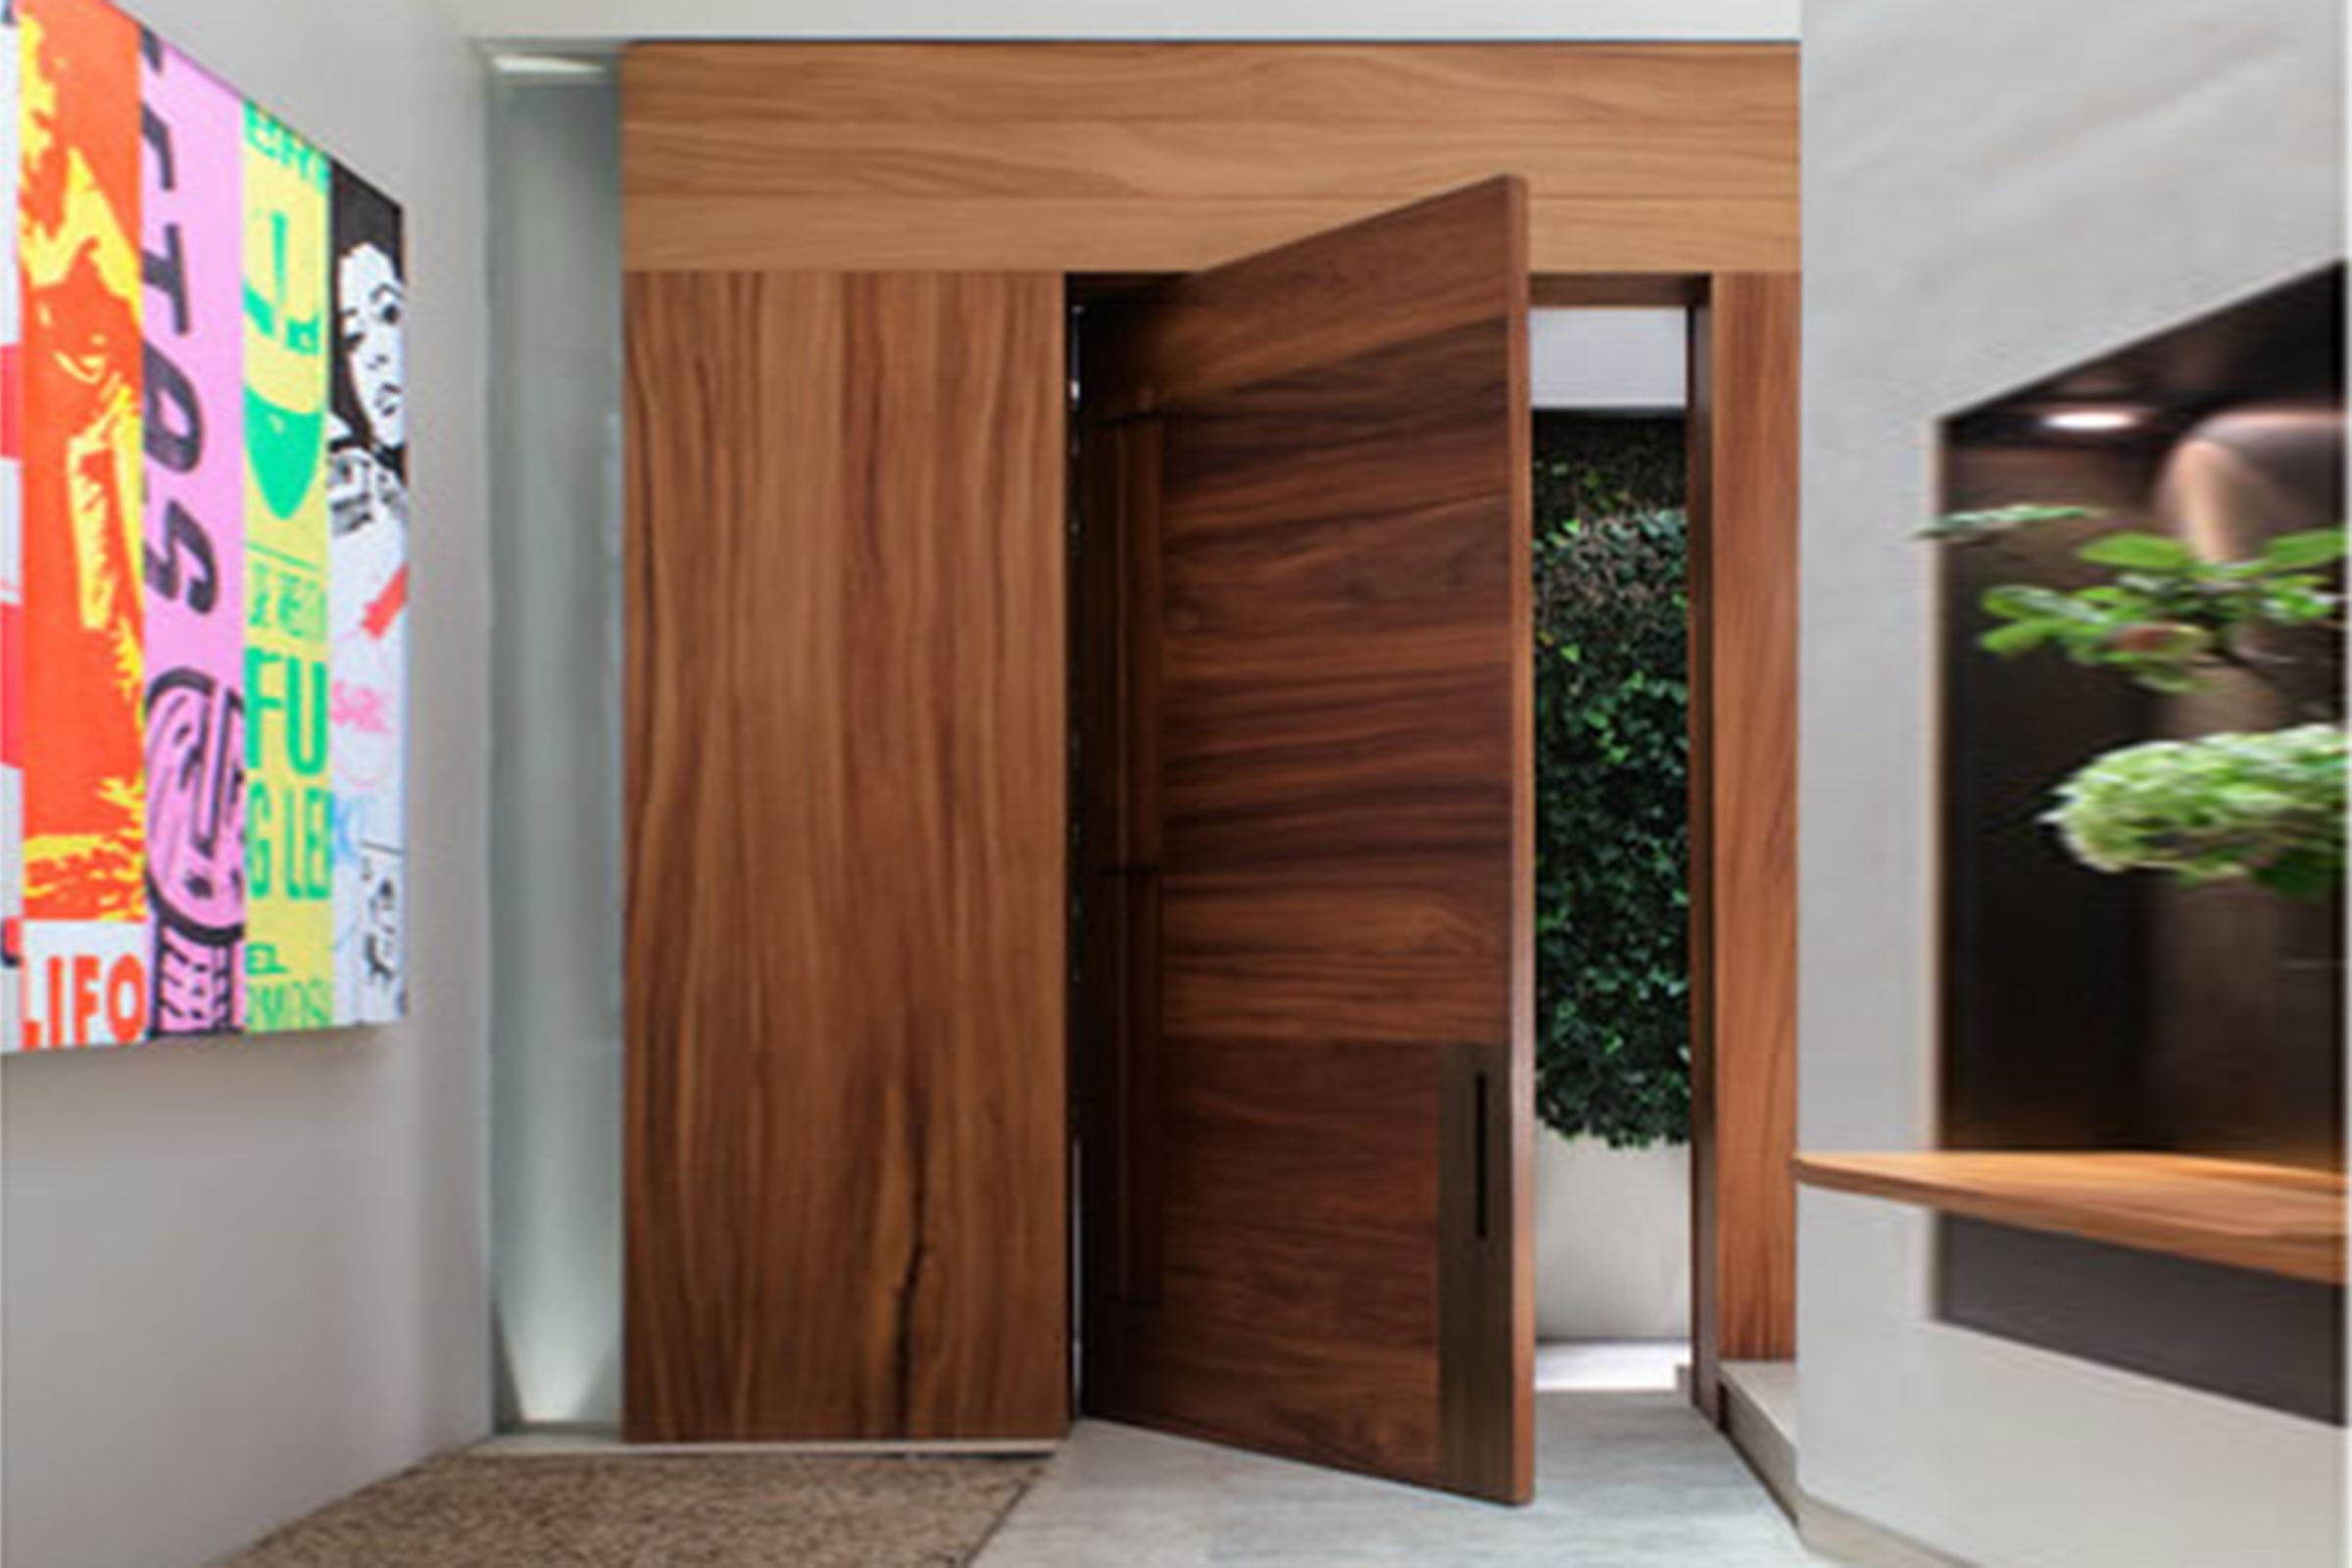 Cửa gỗ laminate vân gỗ đẹp 11